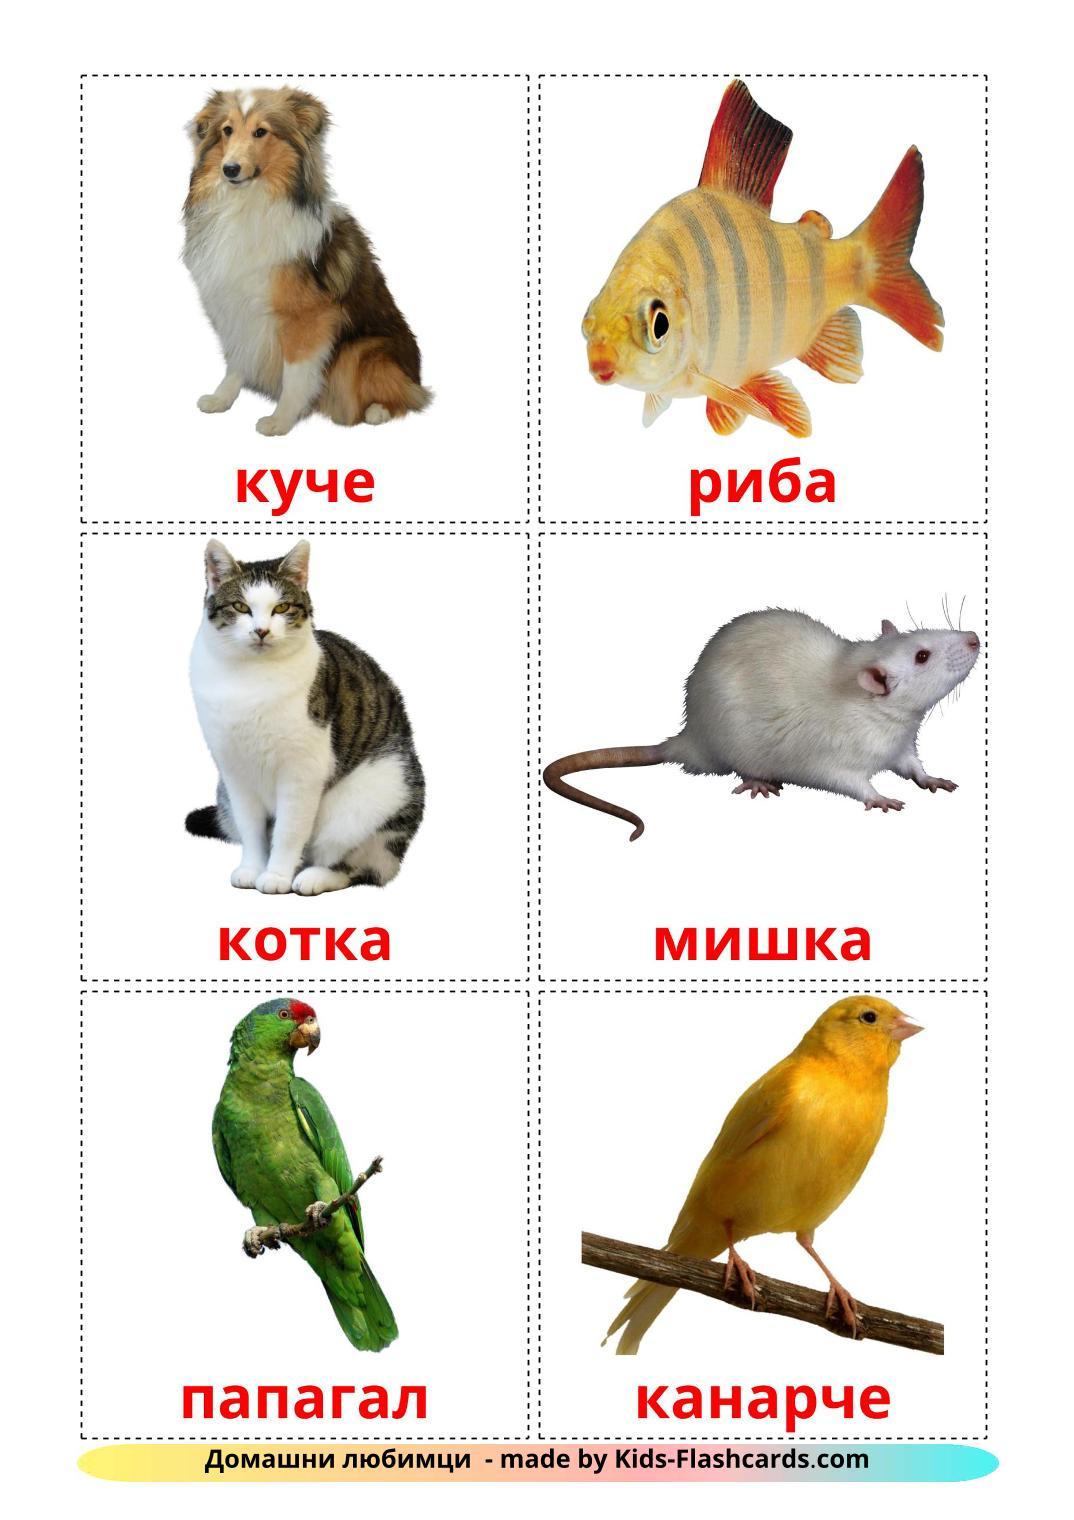 Domestic animals - 10 Free Printable bulgarian Flashcards